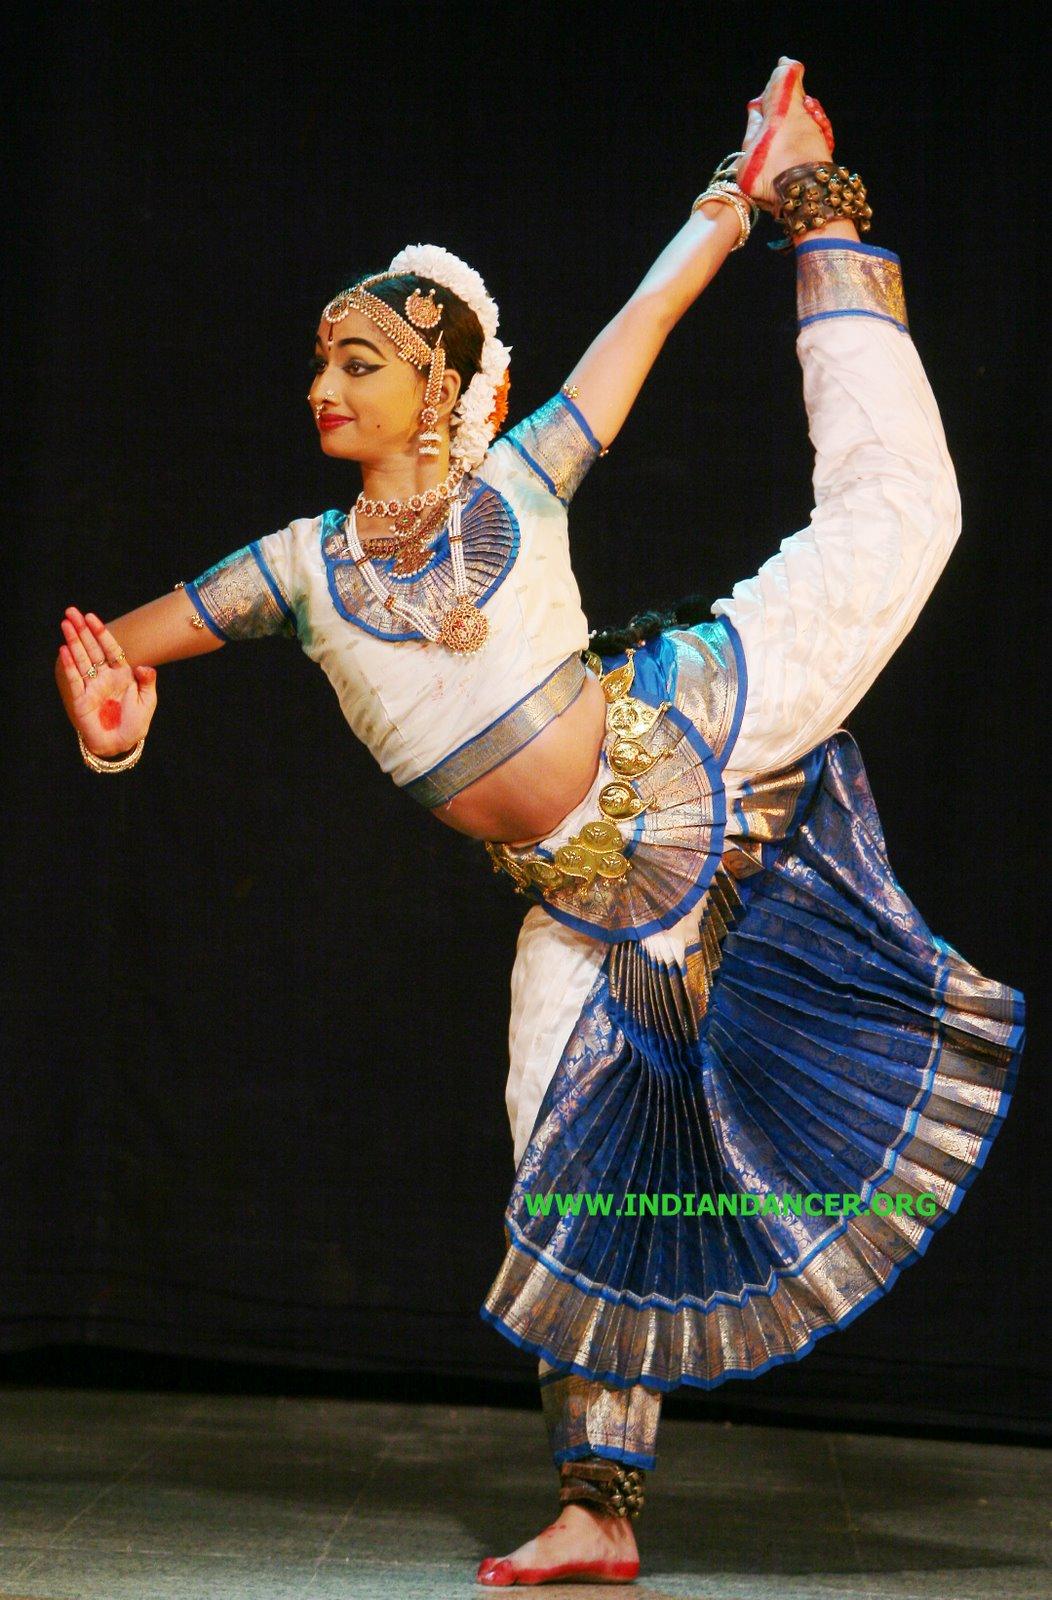 bharatanatyam poses - photo #31